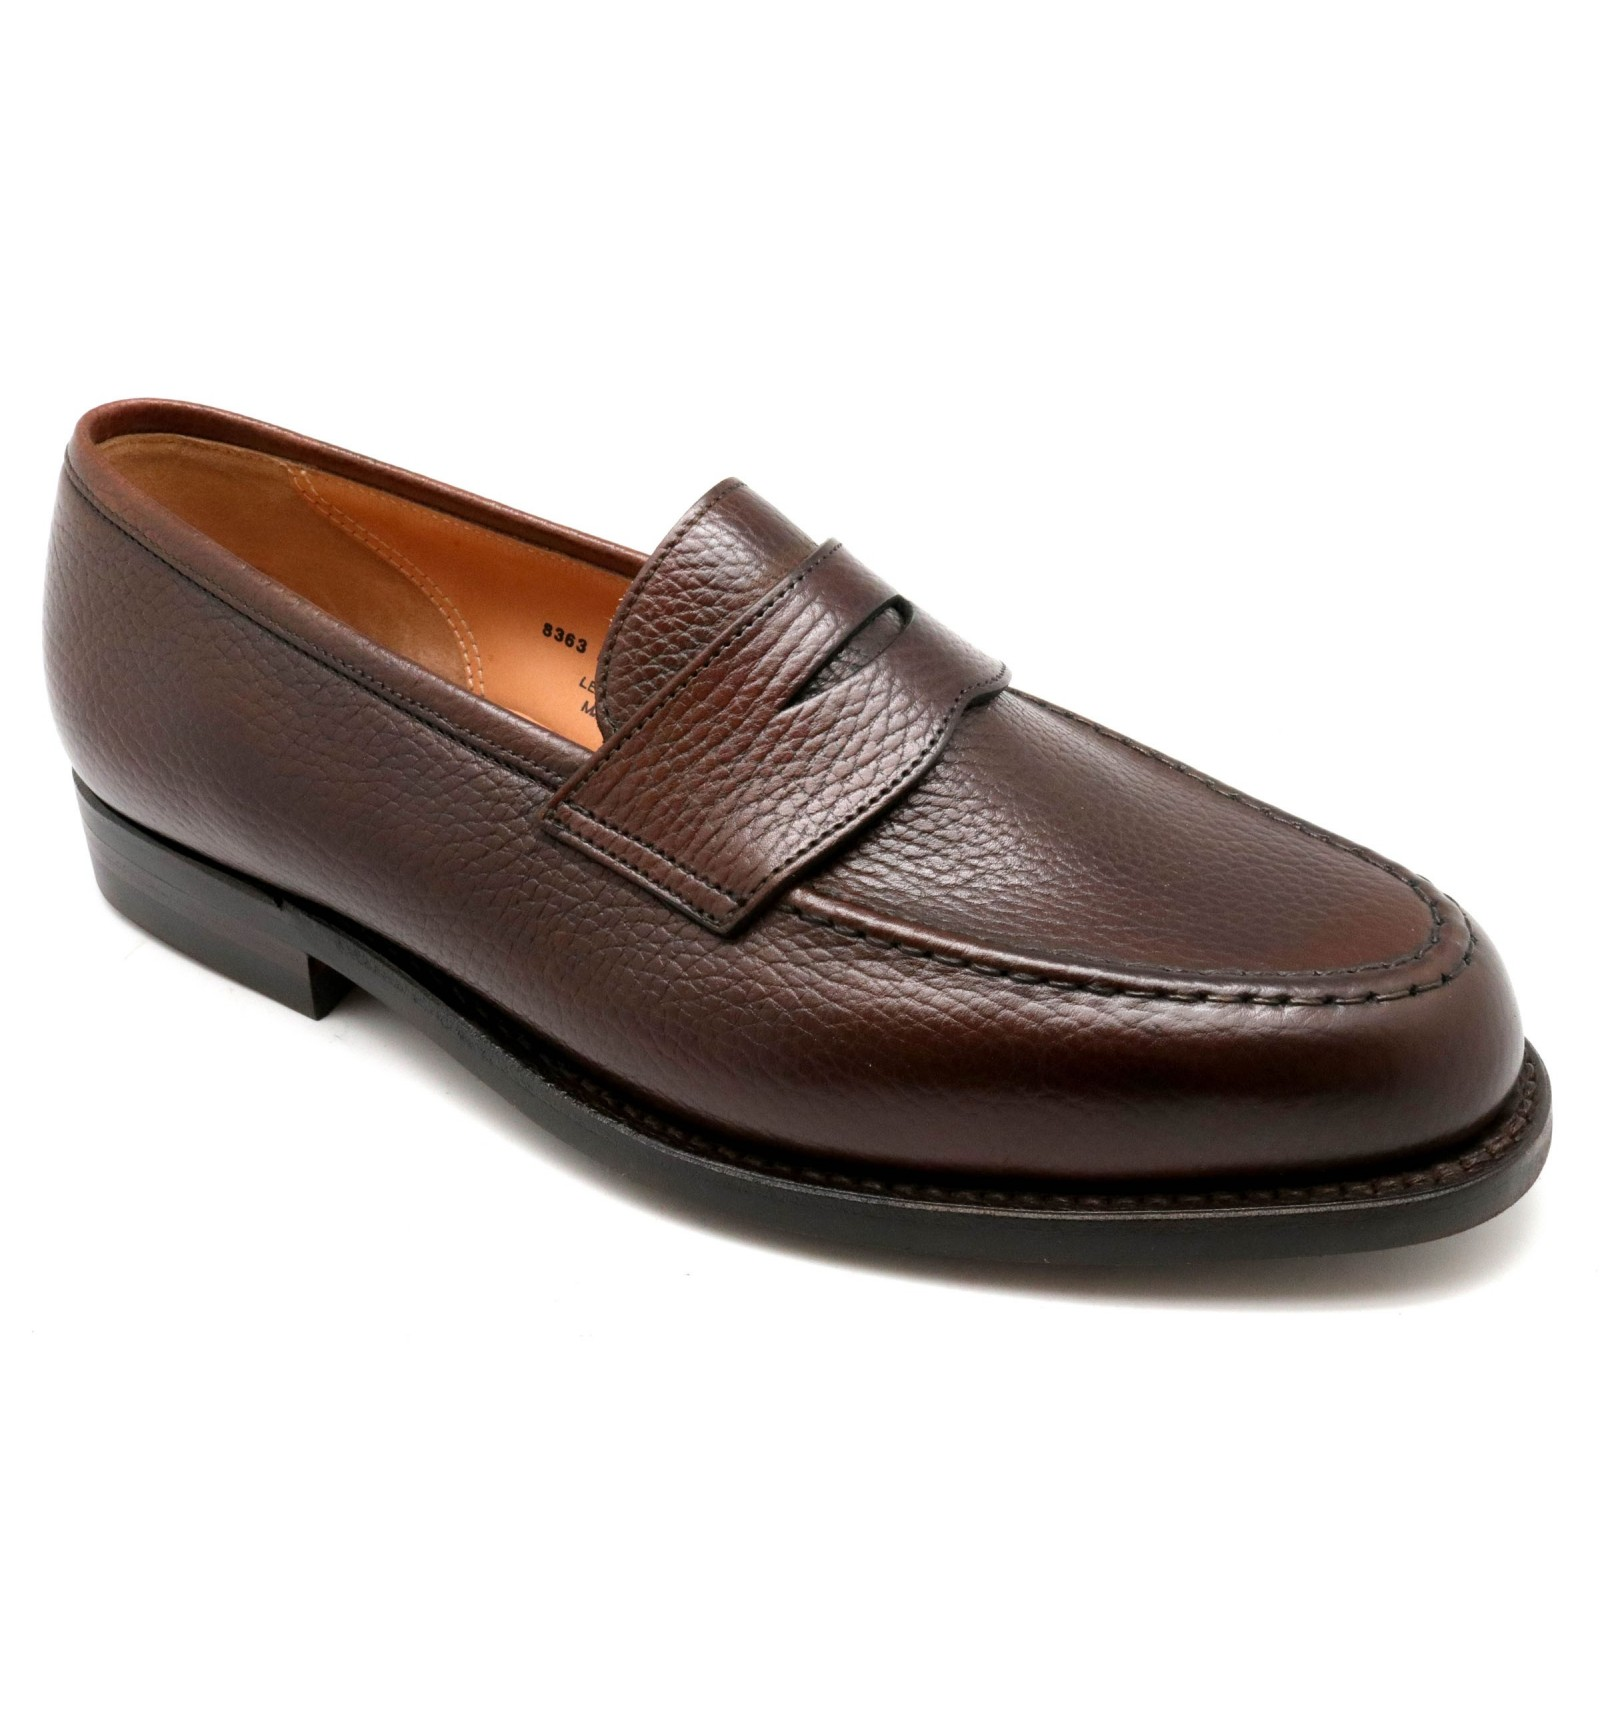 Zapatos Boston Crockett   Jones 6e891d39a82